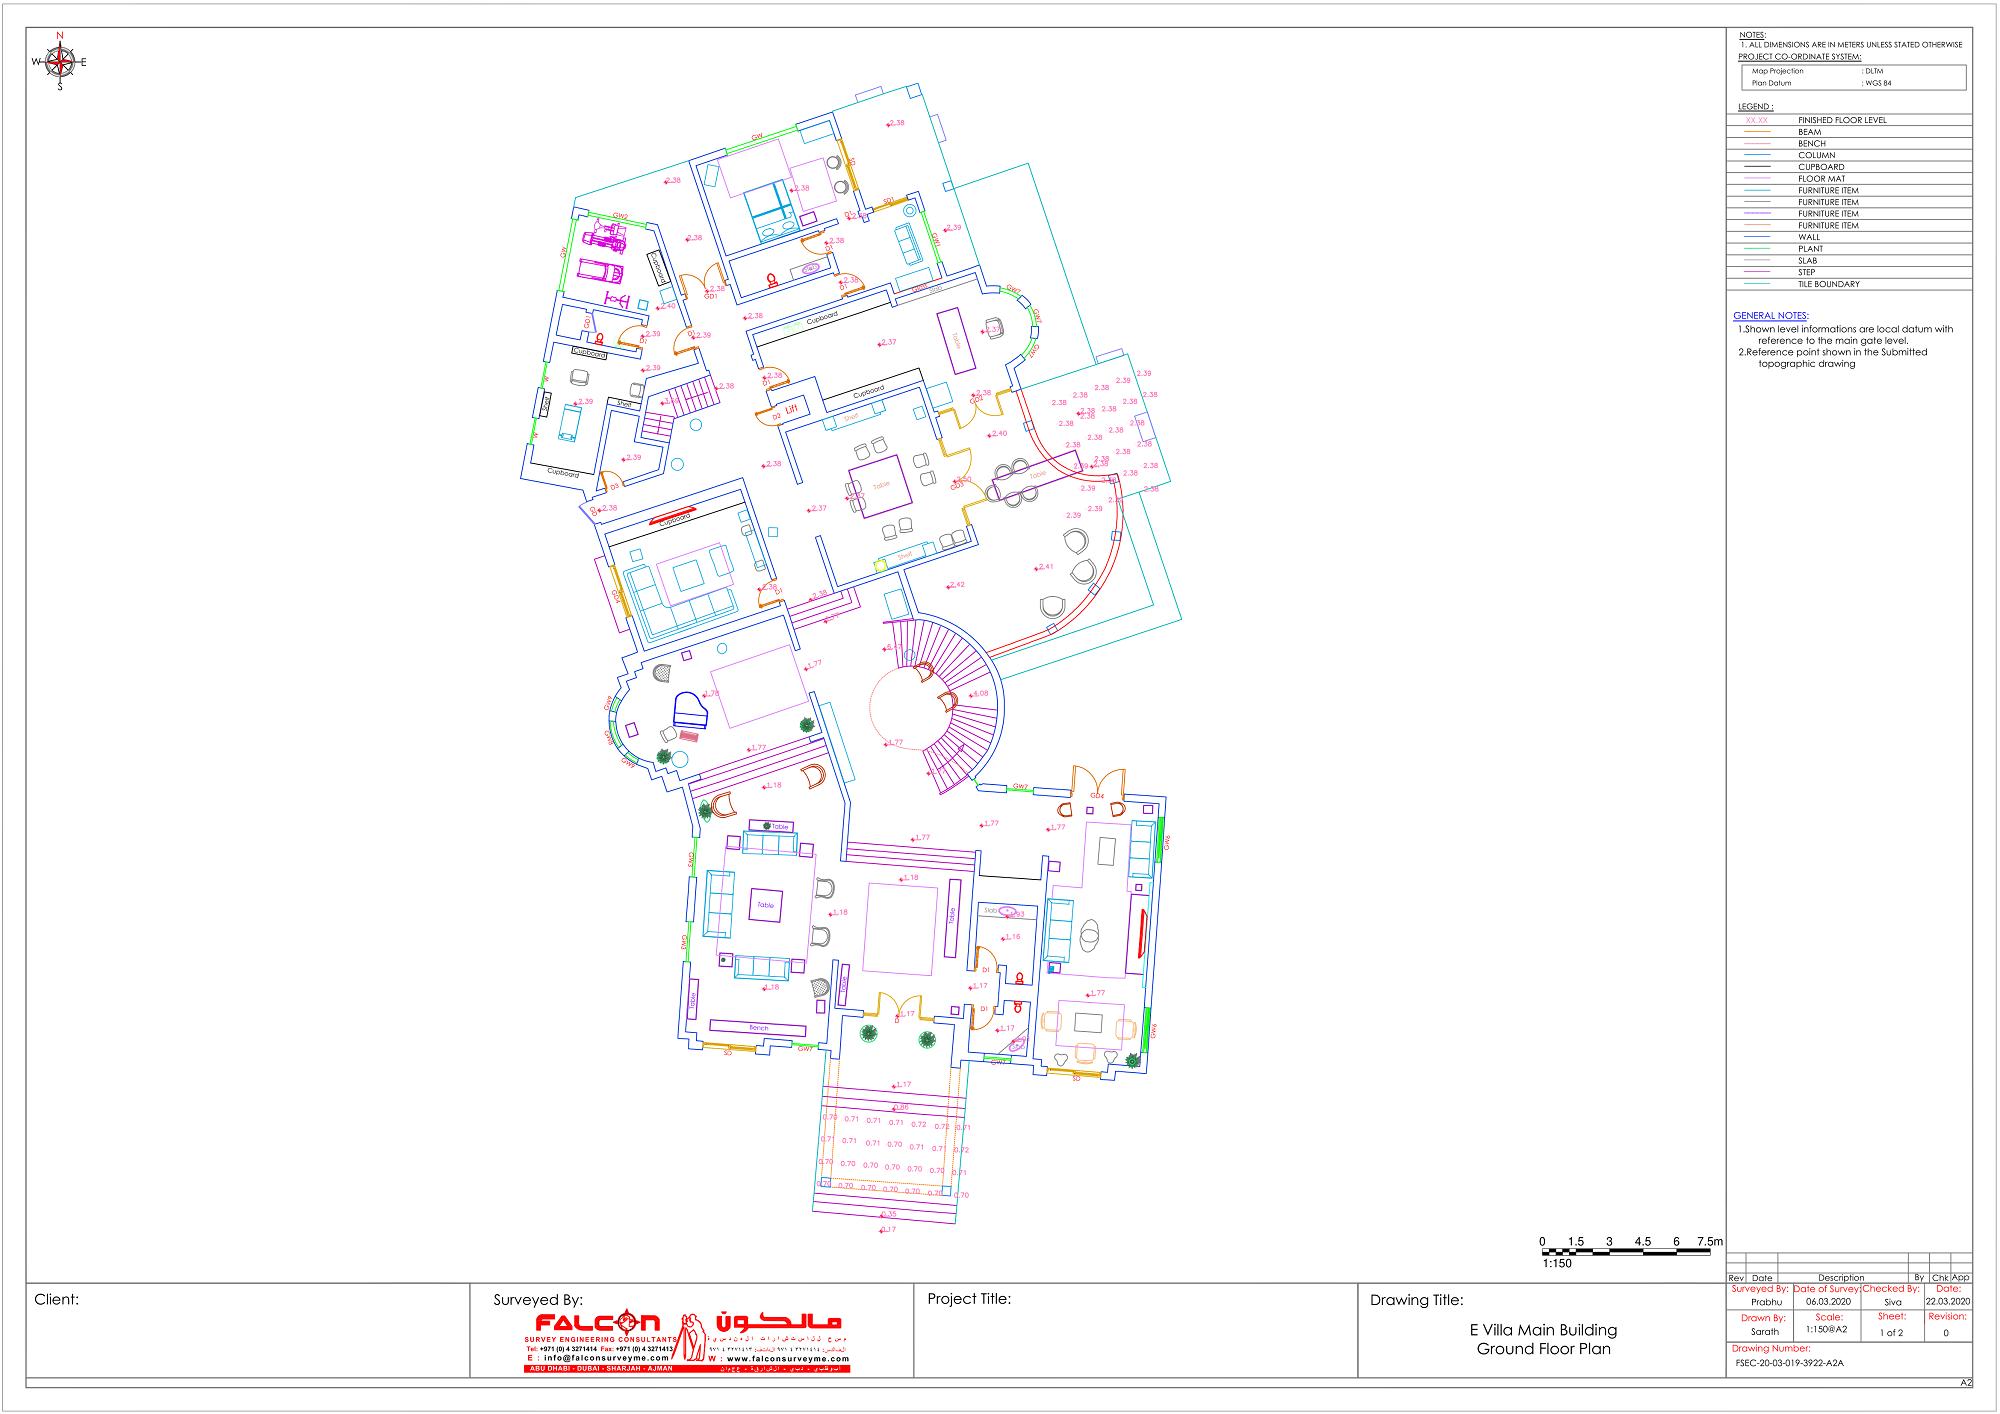 Ground Floor Plan of the Villa